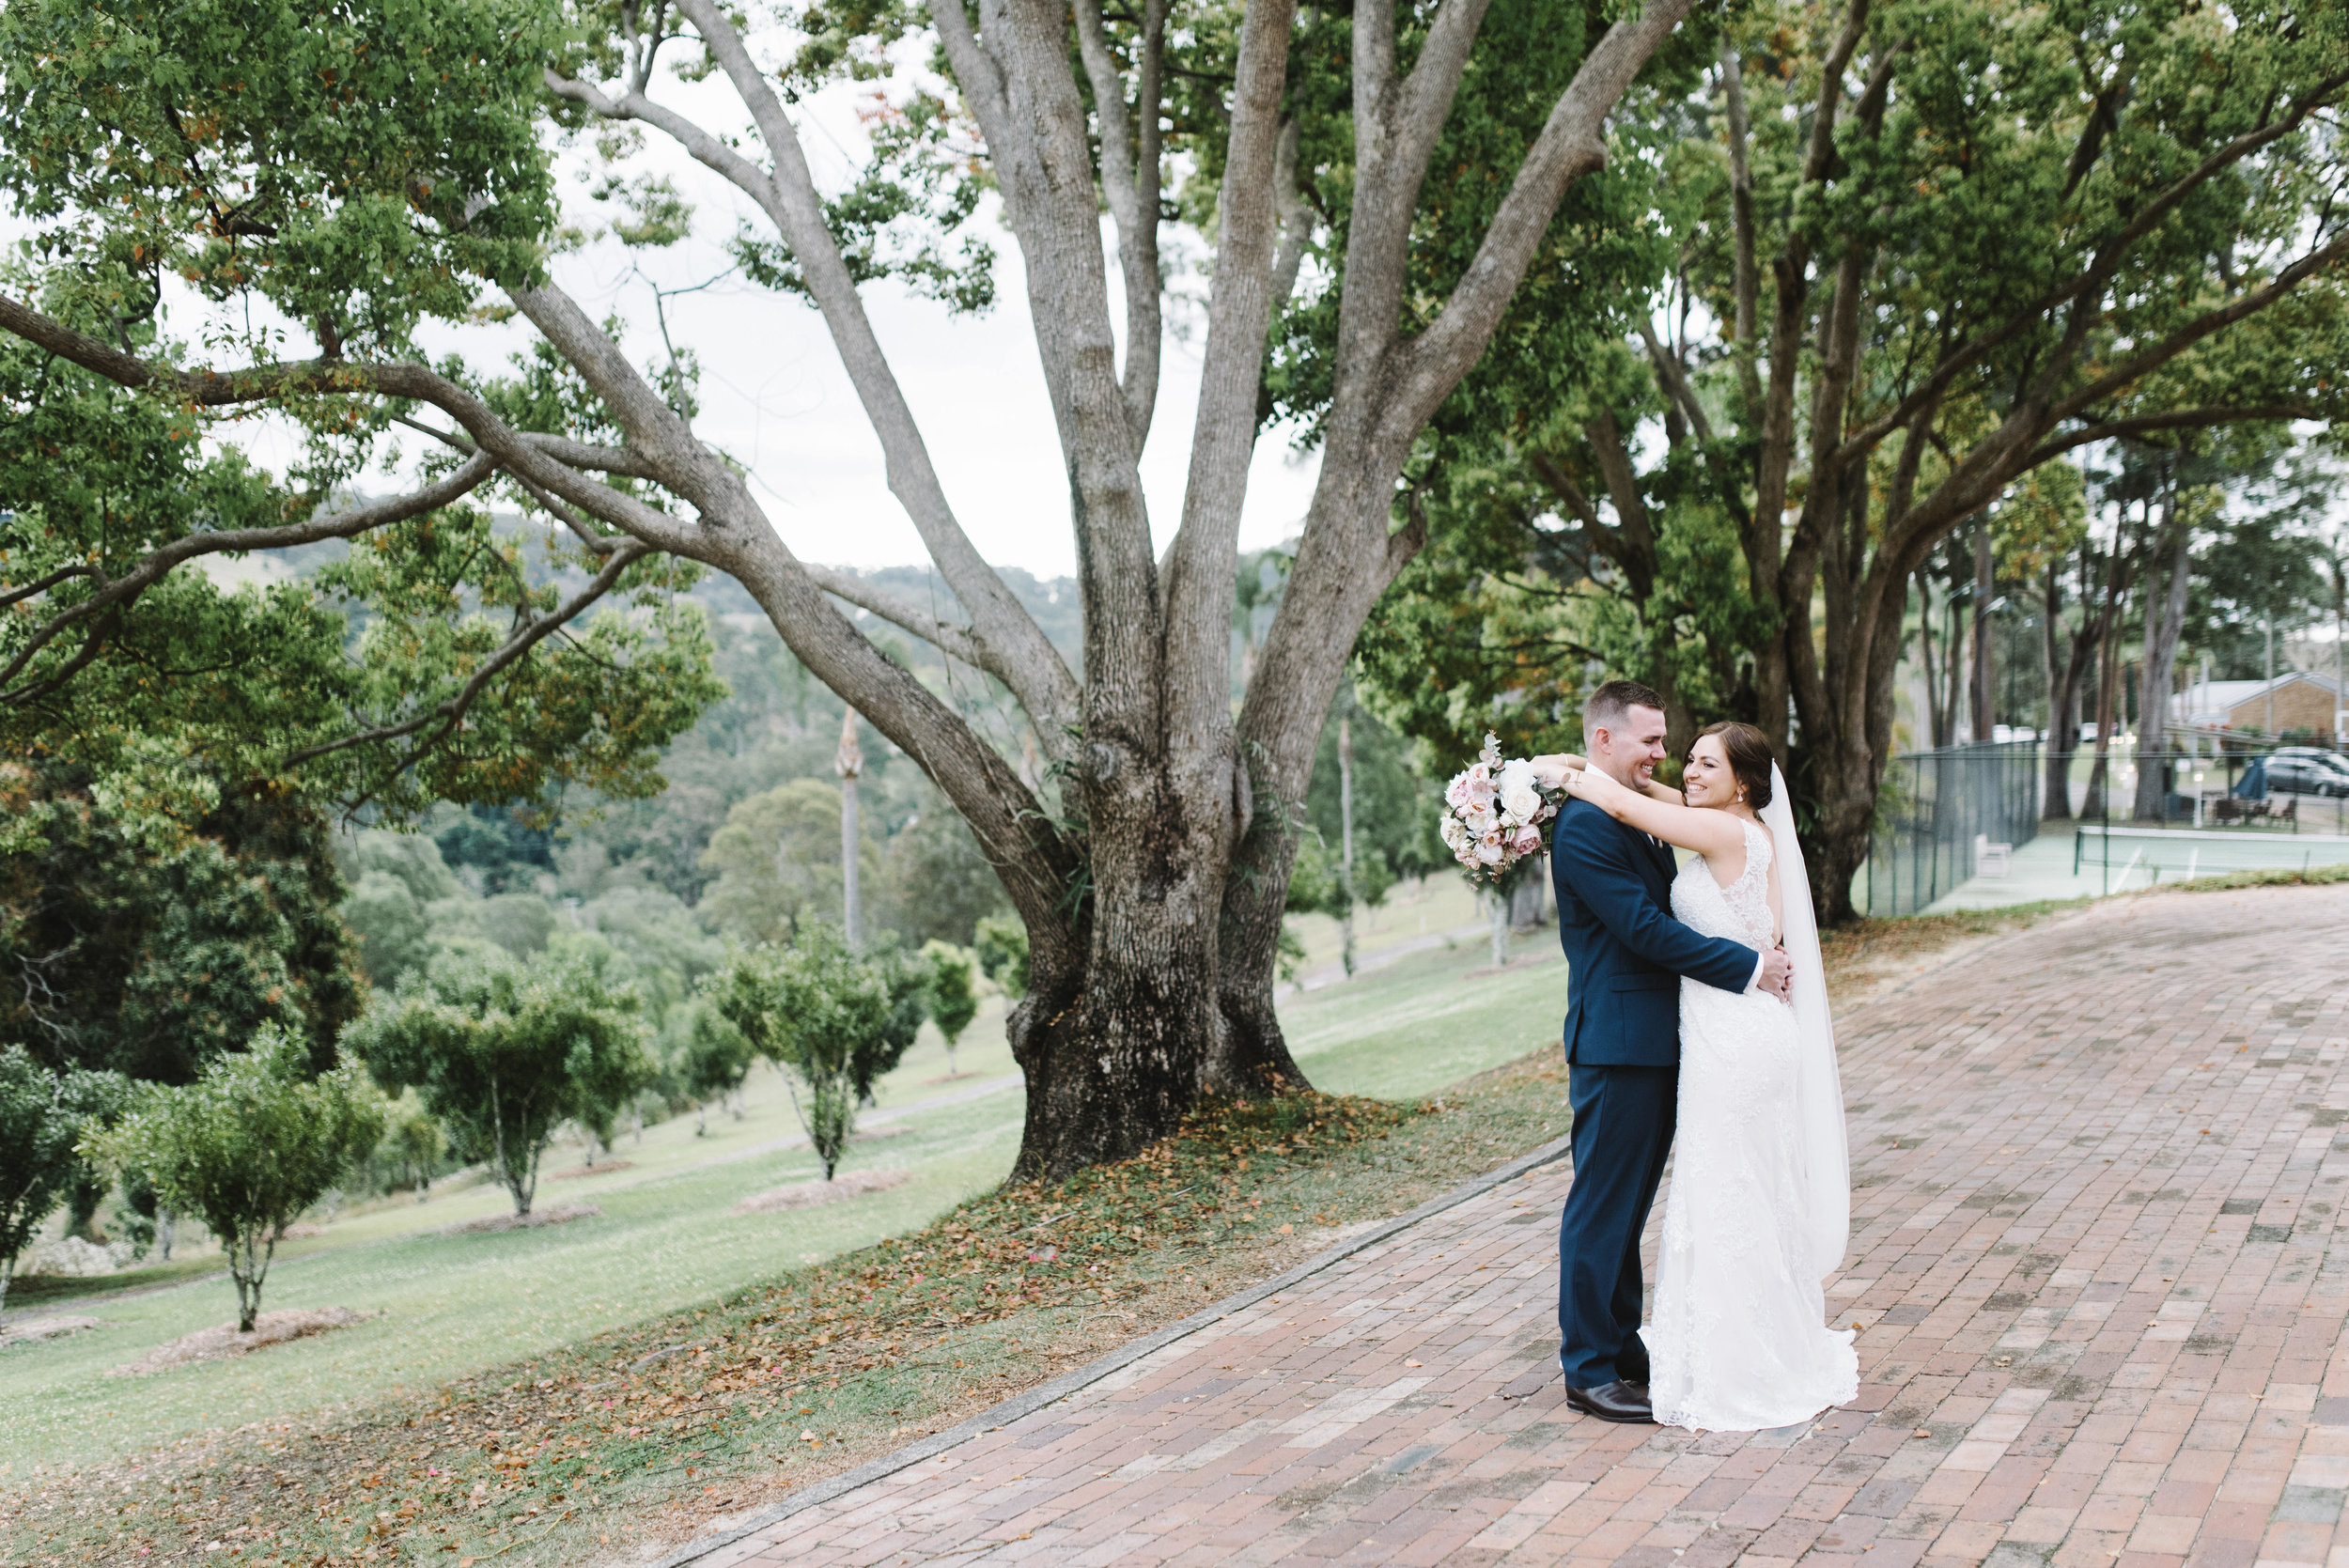 LAURENOLIVIA-austinvilla-estate-wedding-58.jpg